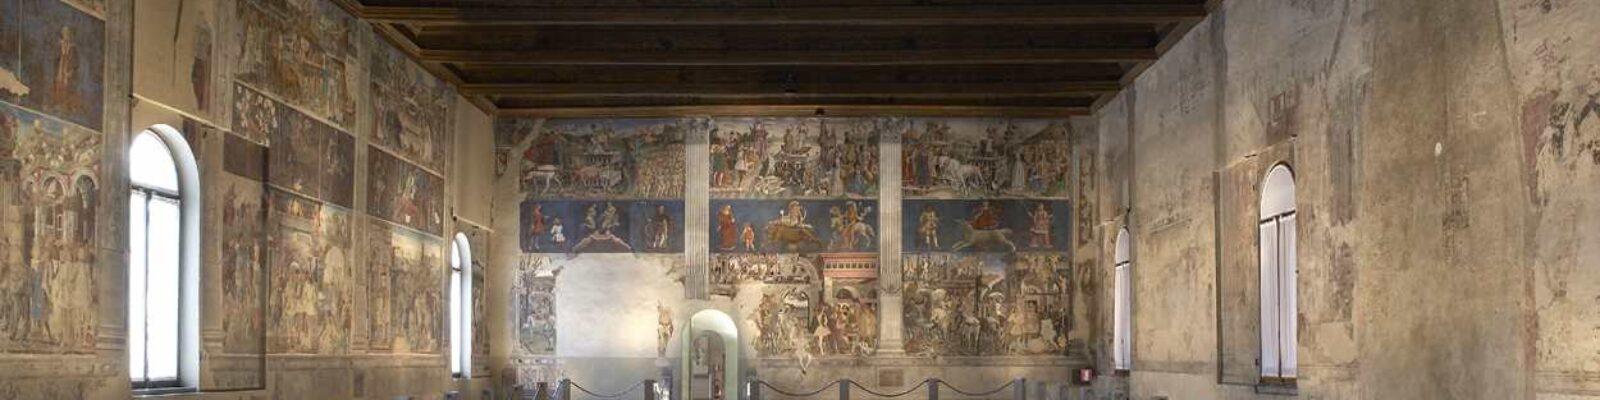 Schifanoia Palace The Months Hall sala grande - illuminazione musei